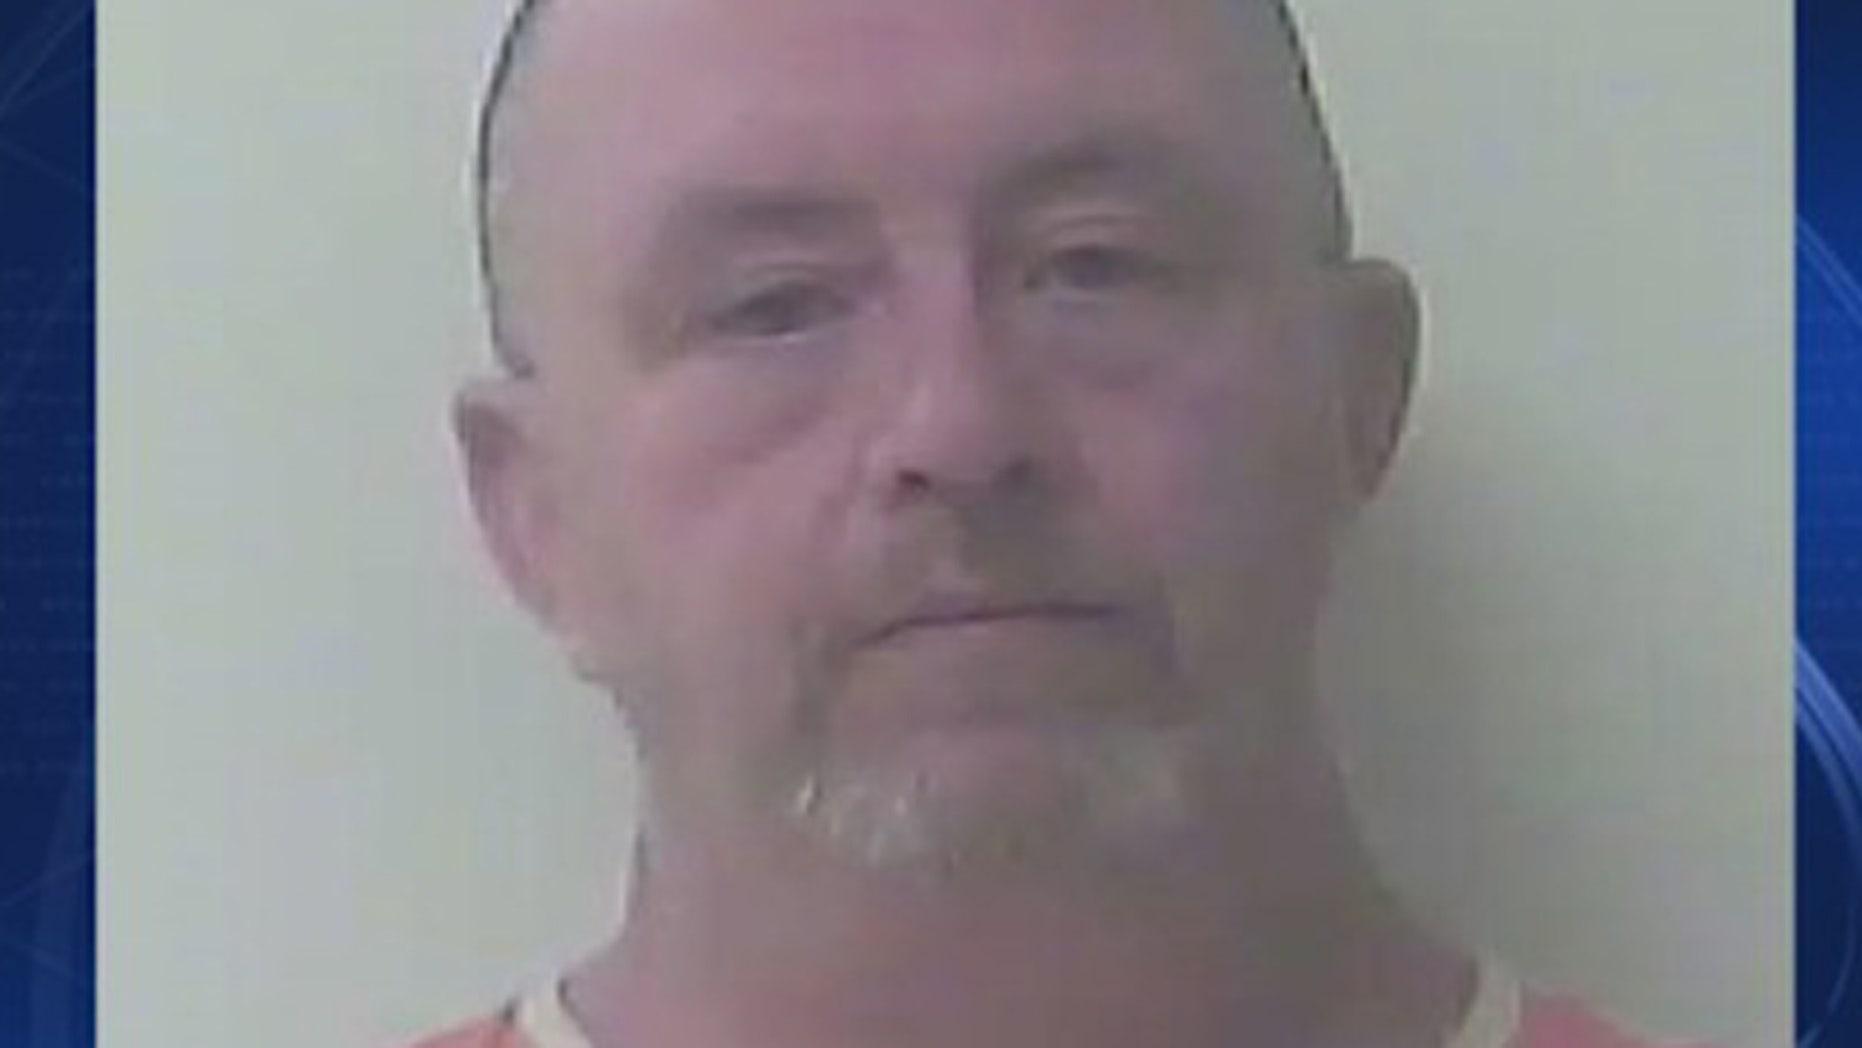 Georgia high school janitor Timothy Brian Burnette's phone was discovered inside the girl's locker room.